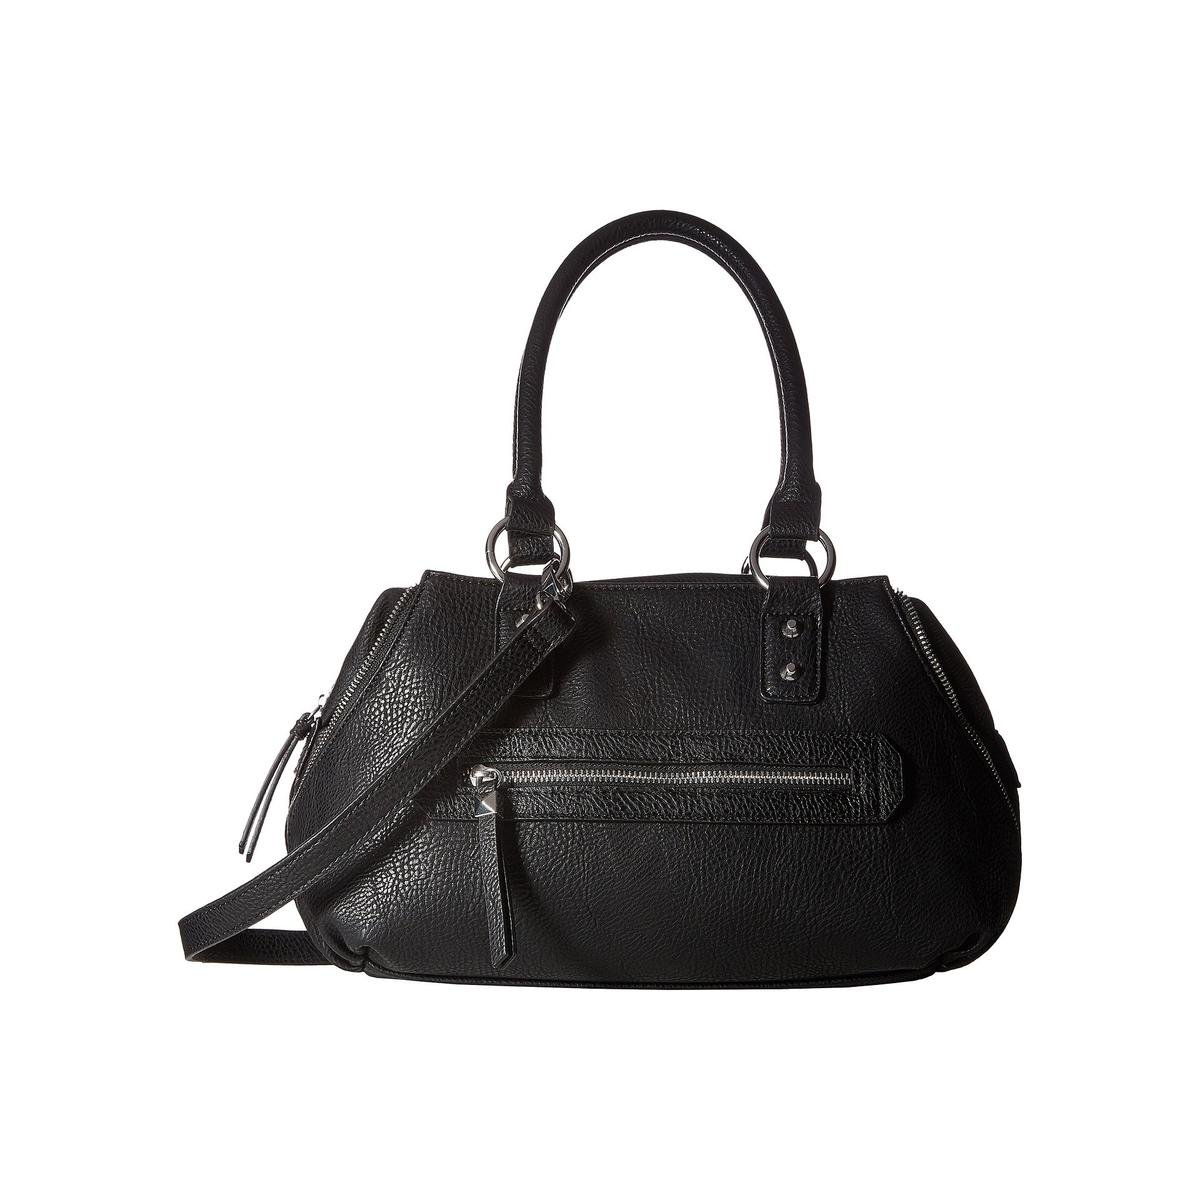 Jessica Simpson Women's Marley Crossbody Satchel Black Handbag